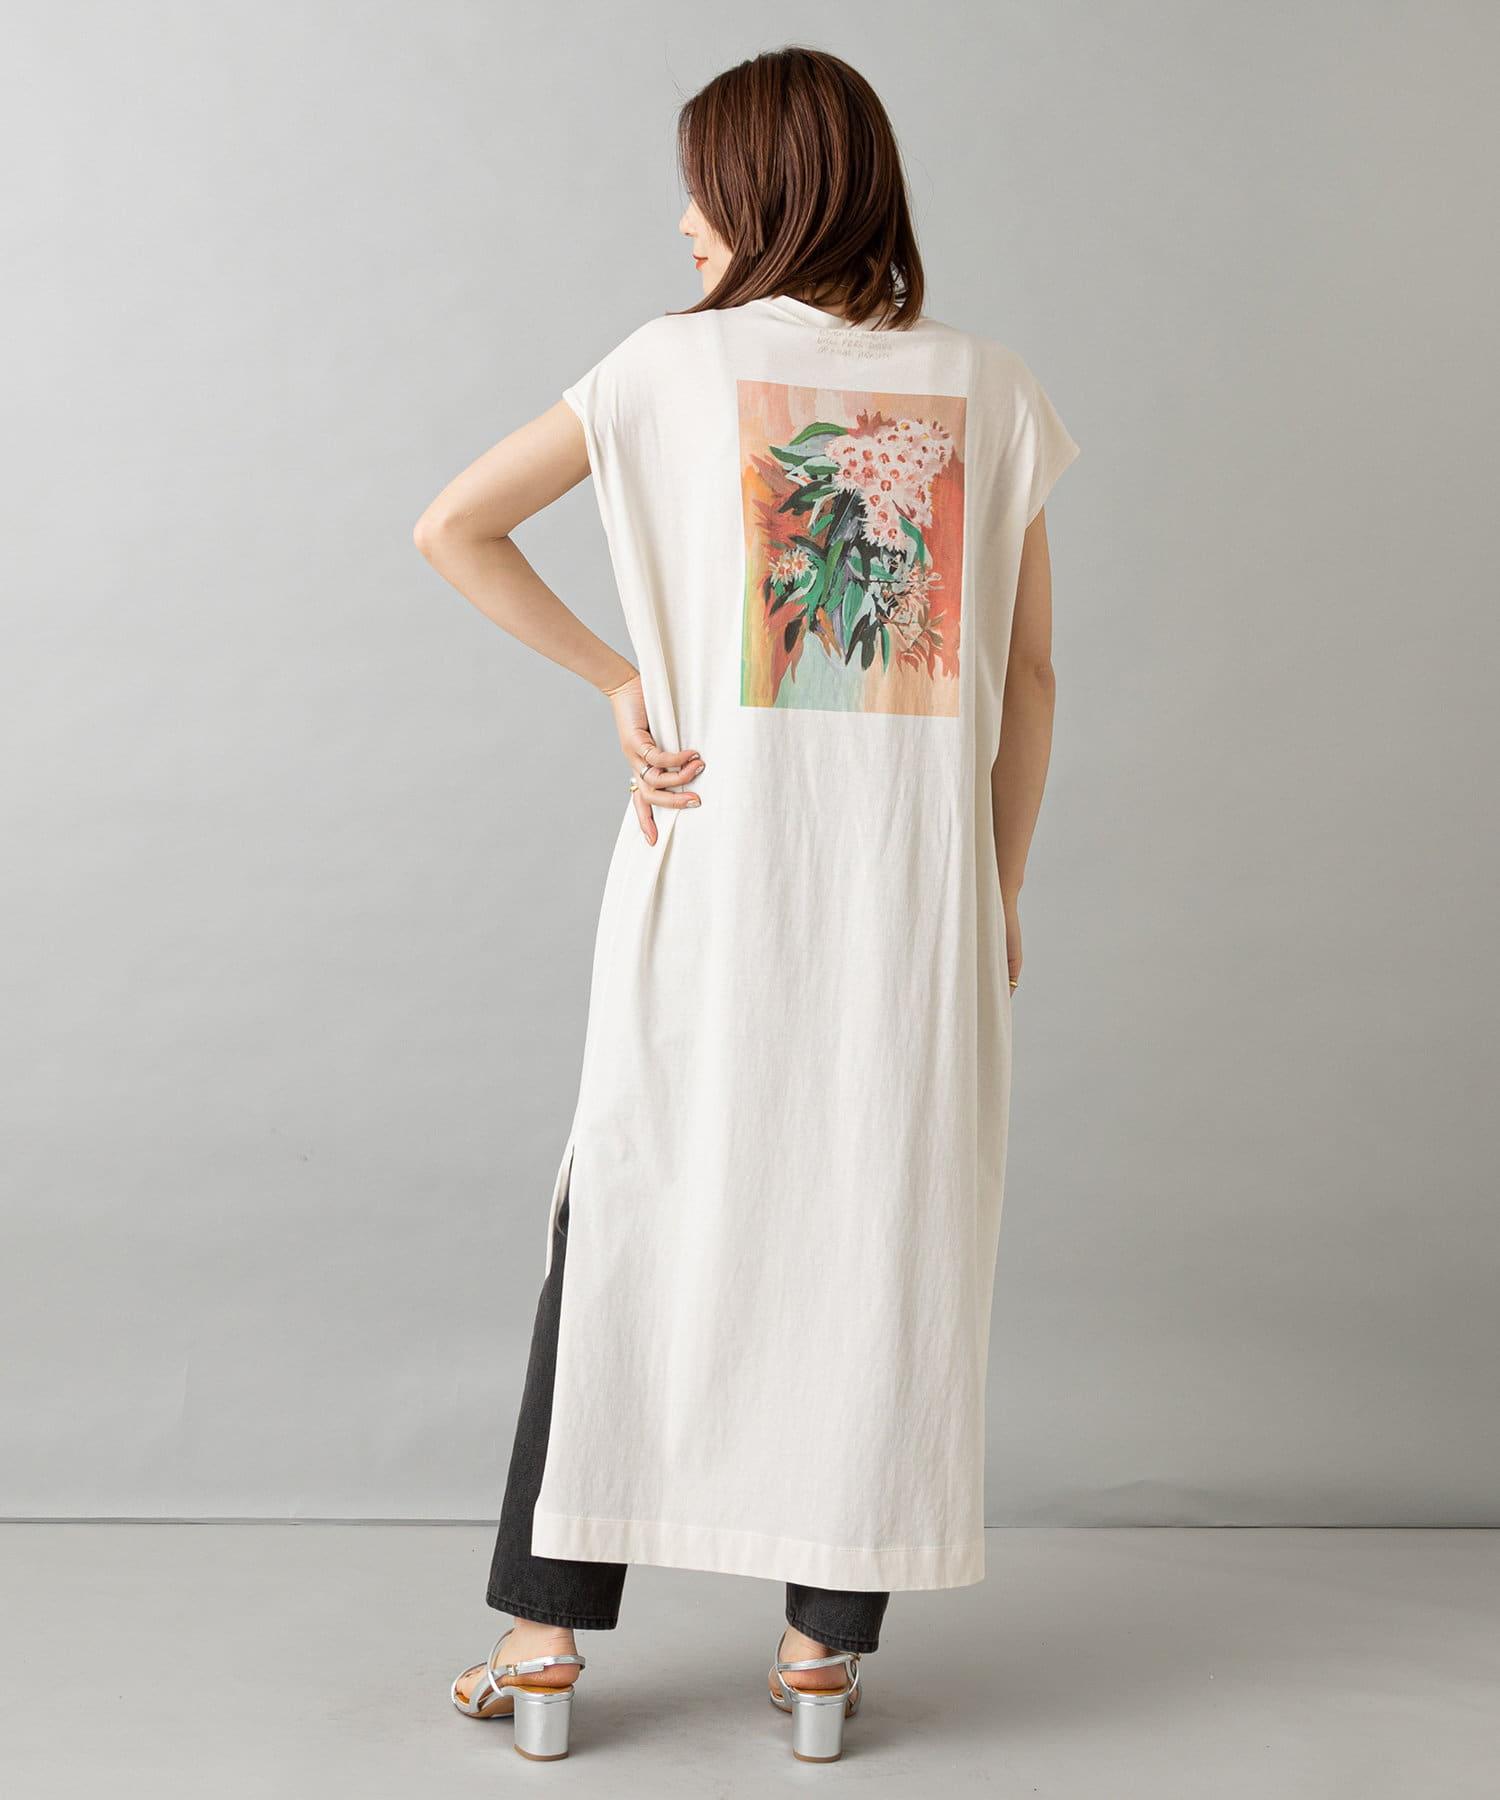 Omekashi(オメカシ) レディース TOLIGHT blooming print onepiece アイボリー